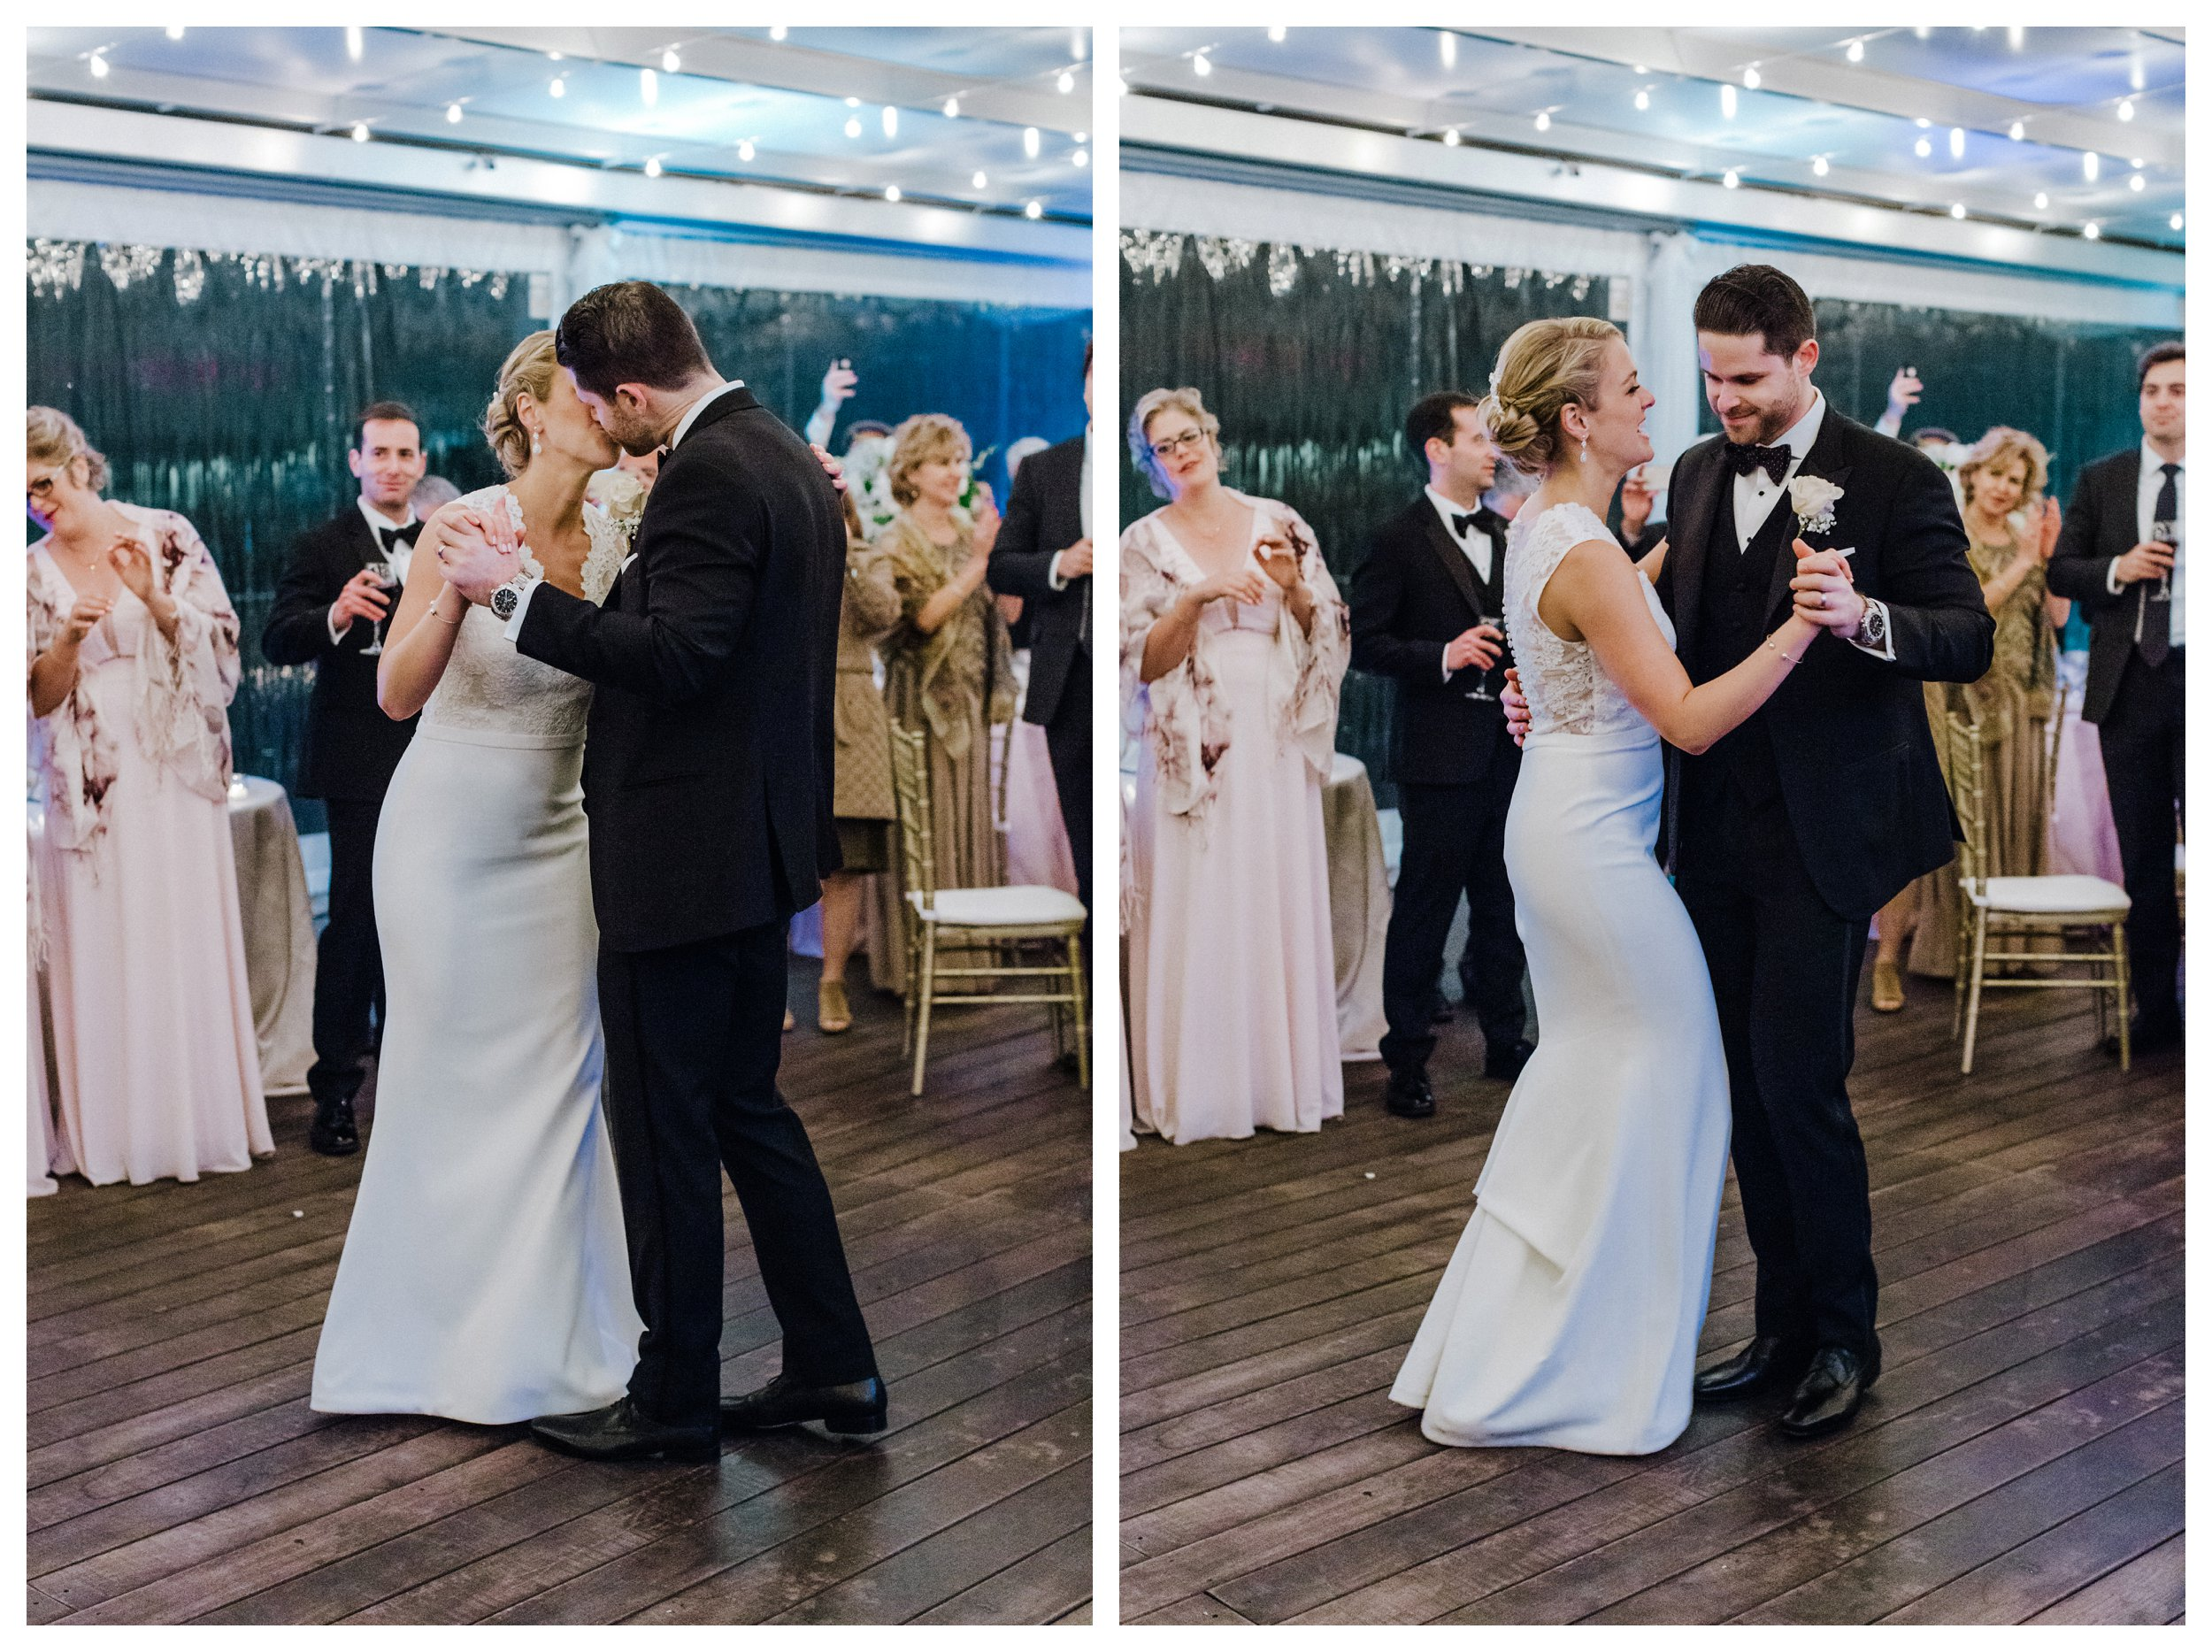 washington-dc-wedding-photographer-49.JPG